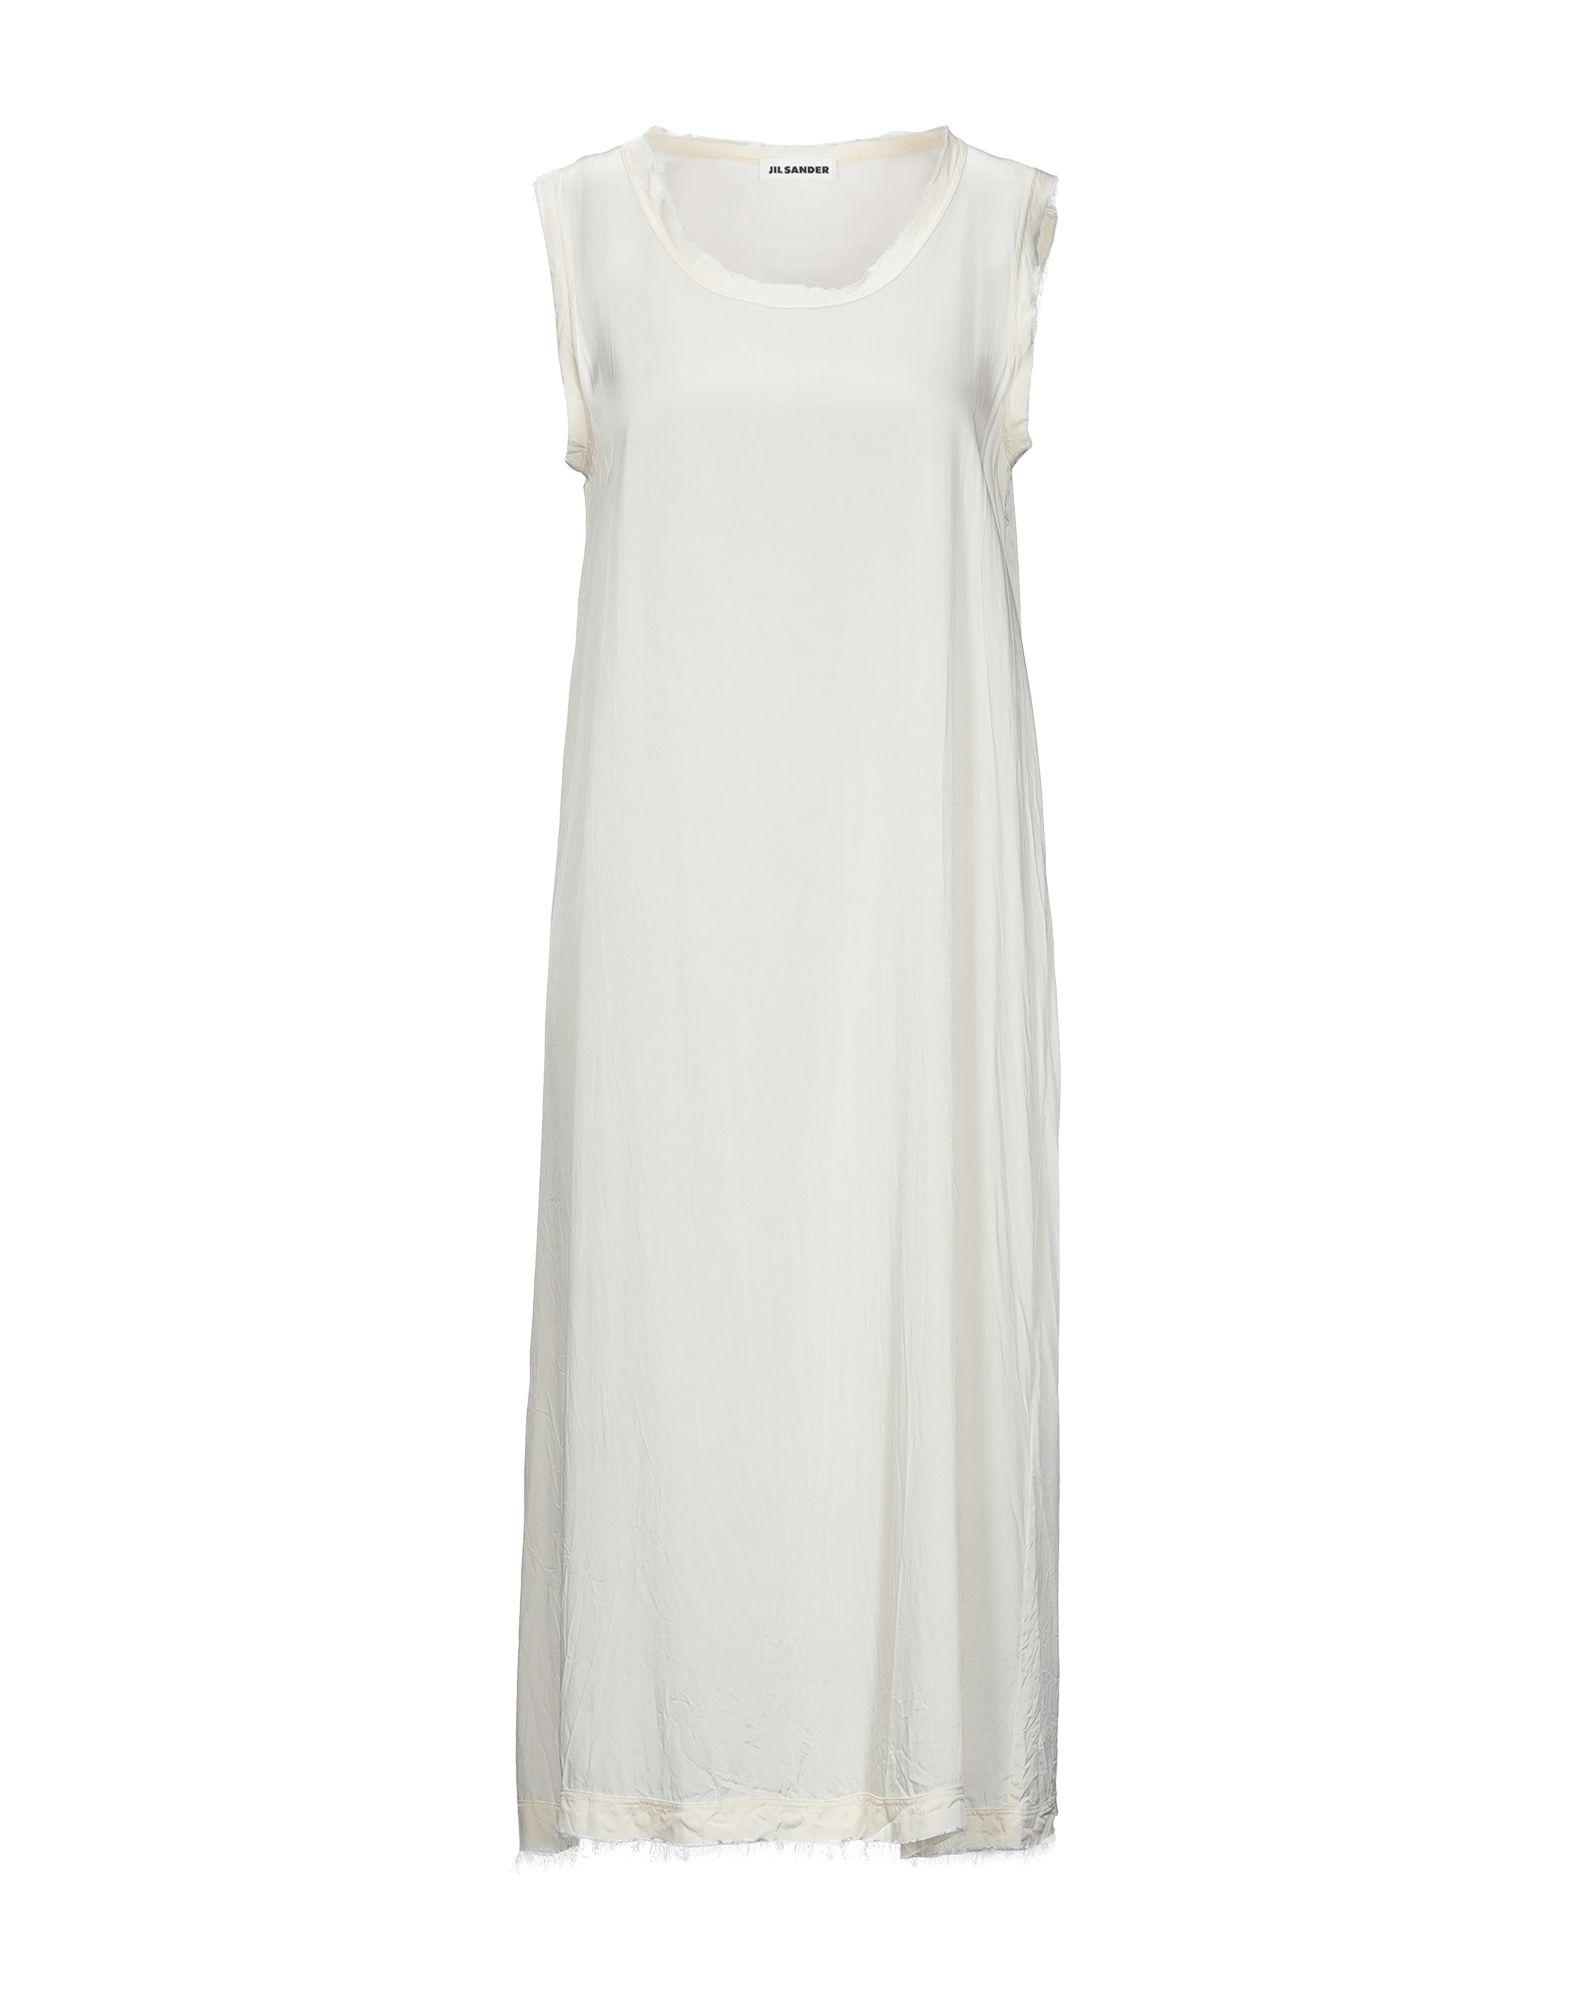 JIL SANDER Slips. satin, no appliqués, basic solid color, round collar, sleeveless, stretch. 95% Viscose, 5% Elastane